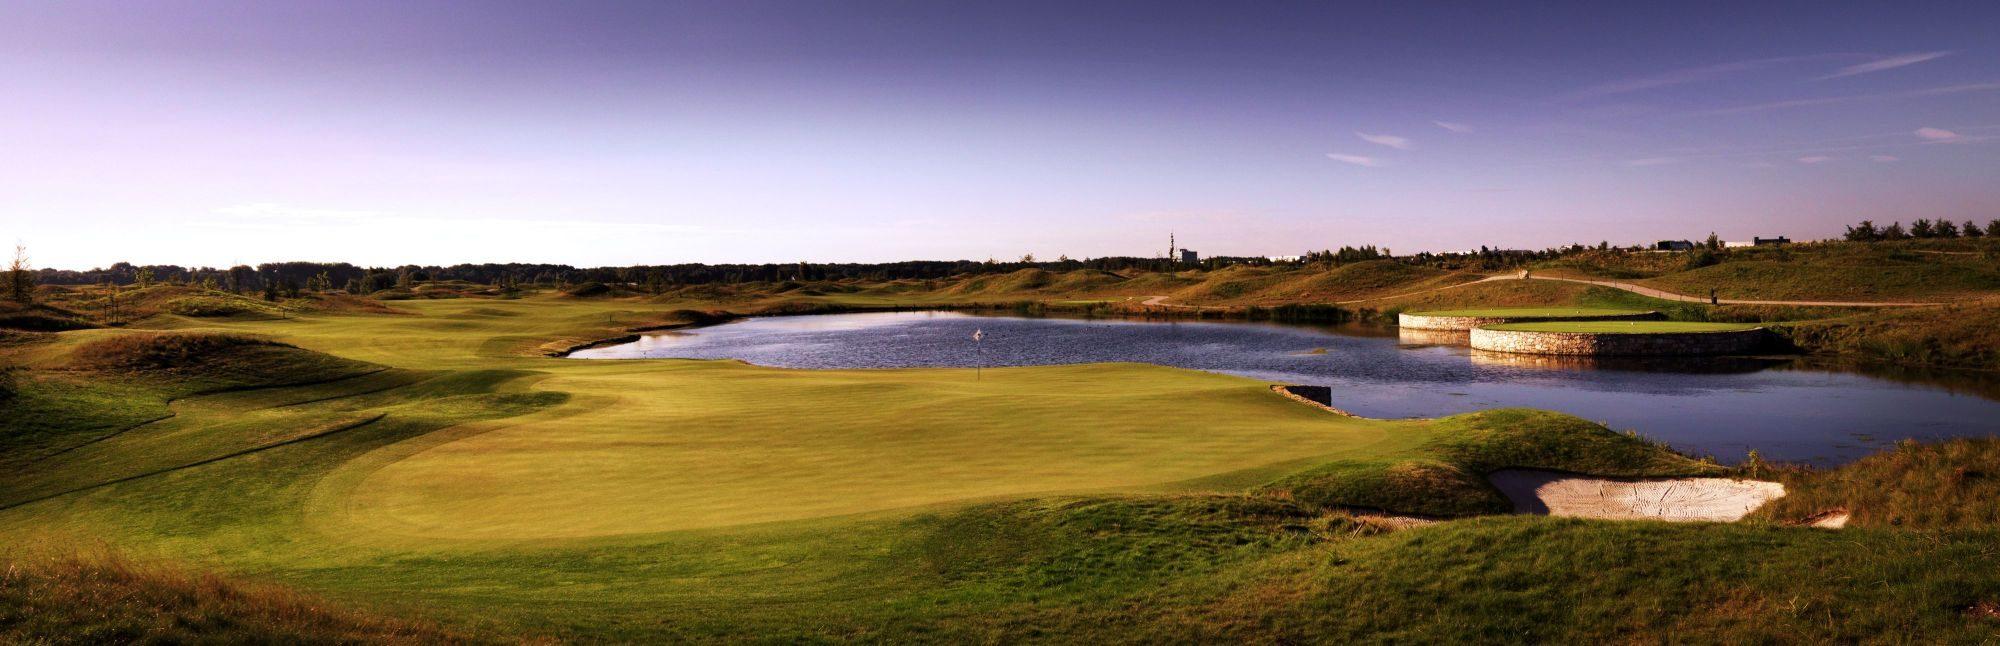 Golfbaan The International